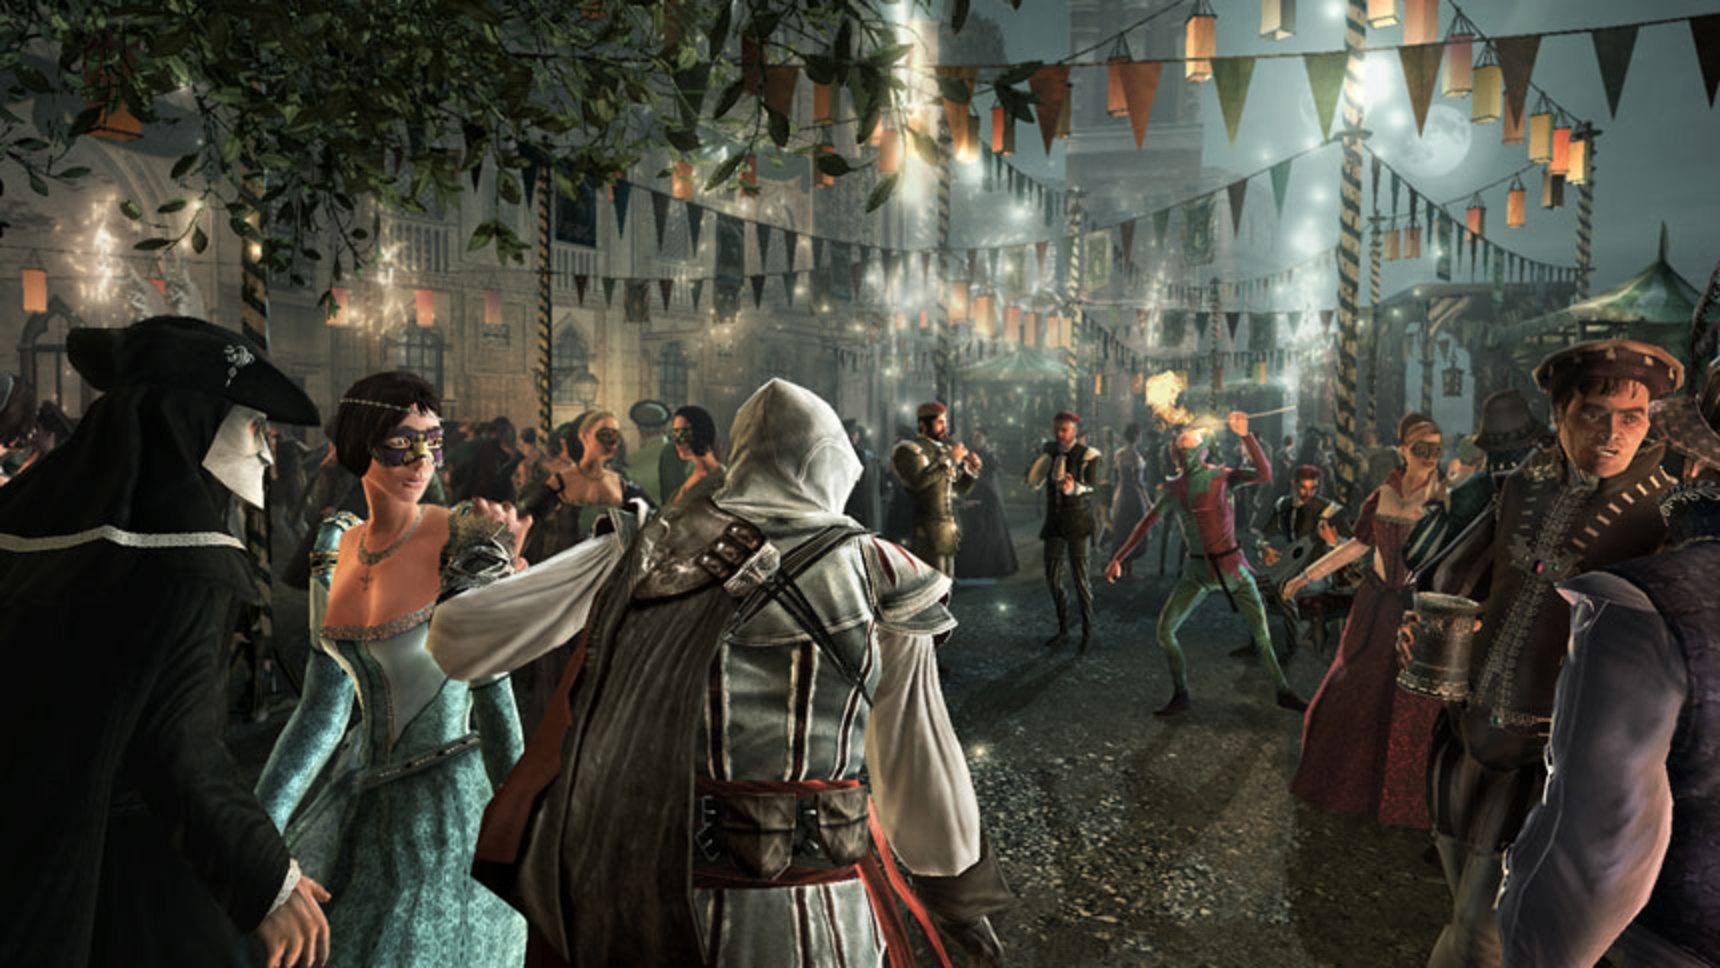 Ubisoft до конца года отключит сетевые функции12 игр — детали